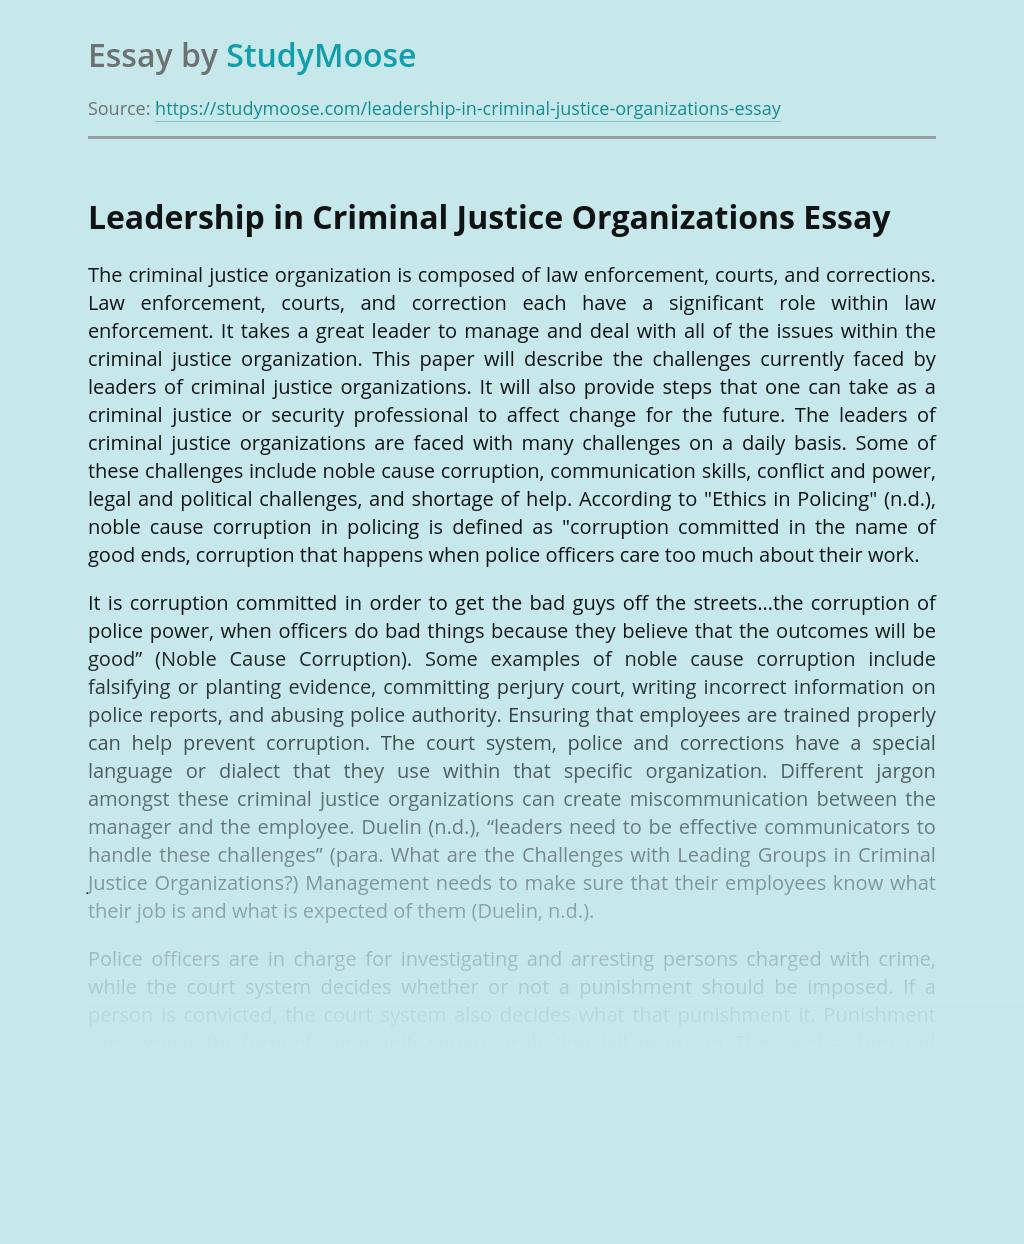 Leadership in Criminal Justice Organizations